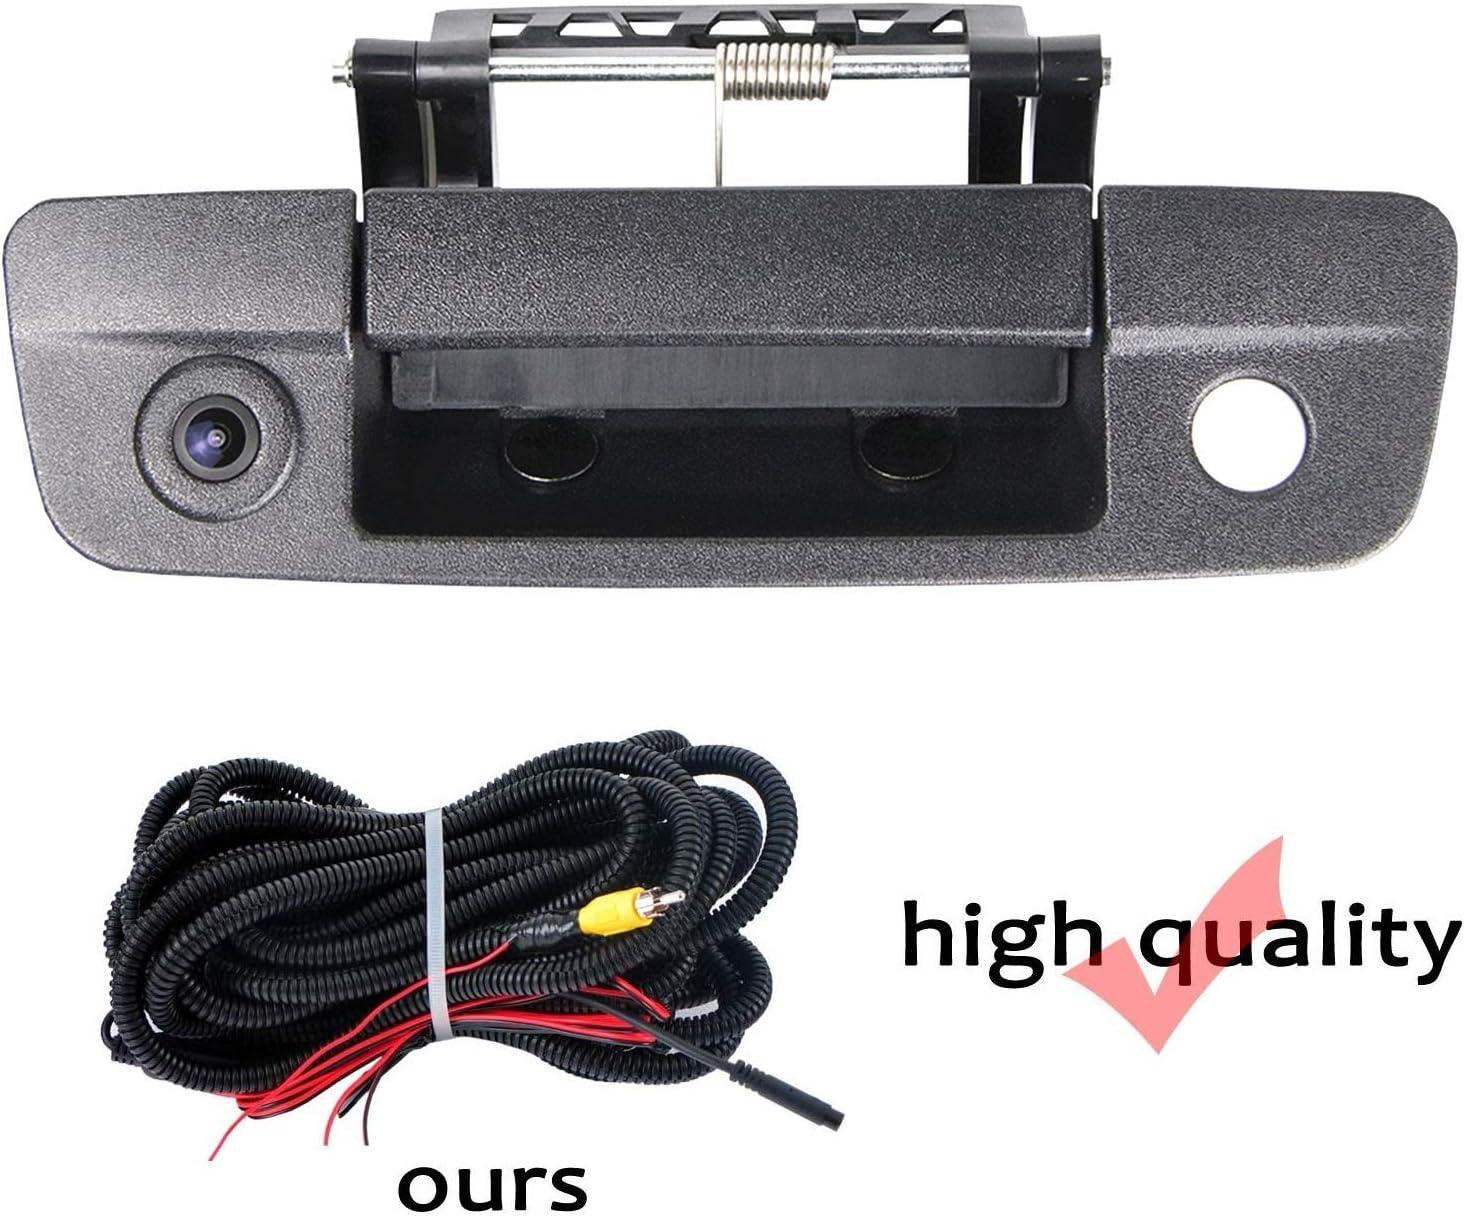 HD 1280x720p Rear Reversing Backup Camera Rearview Tailgate Handle Replacement Camera Night Vision Ip69k Waterproof for Pick-up Dodge Ram 1500 2500 3500 2009-2012